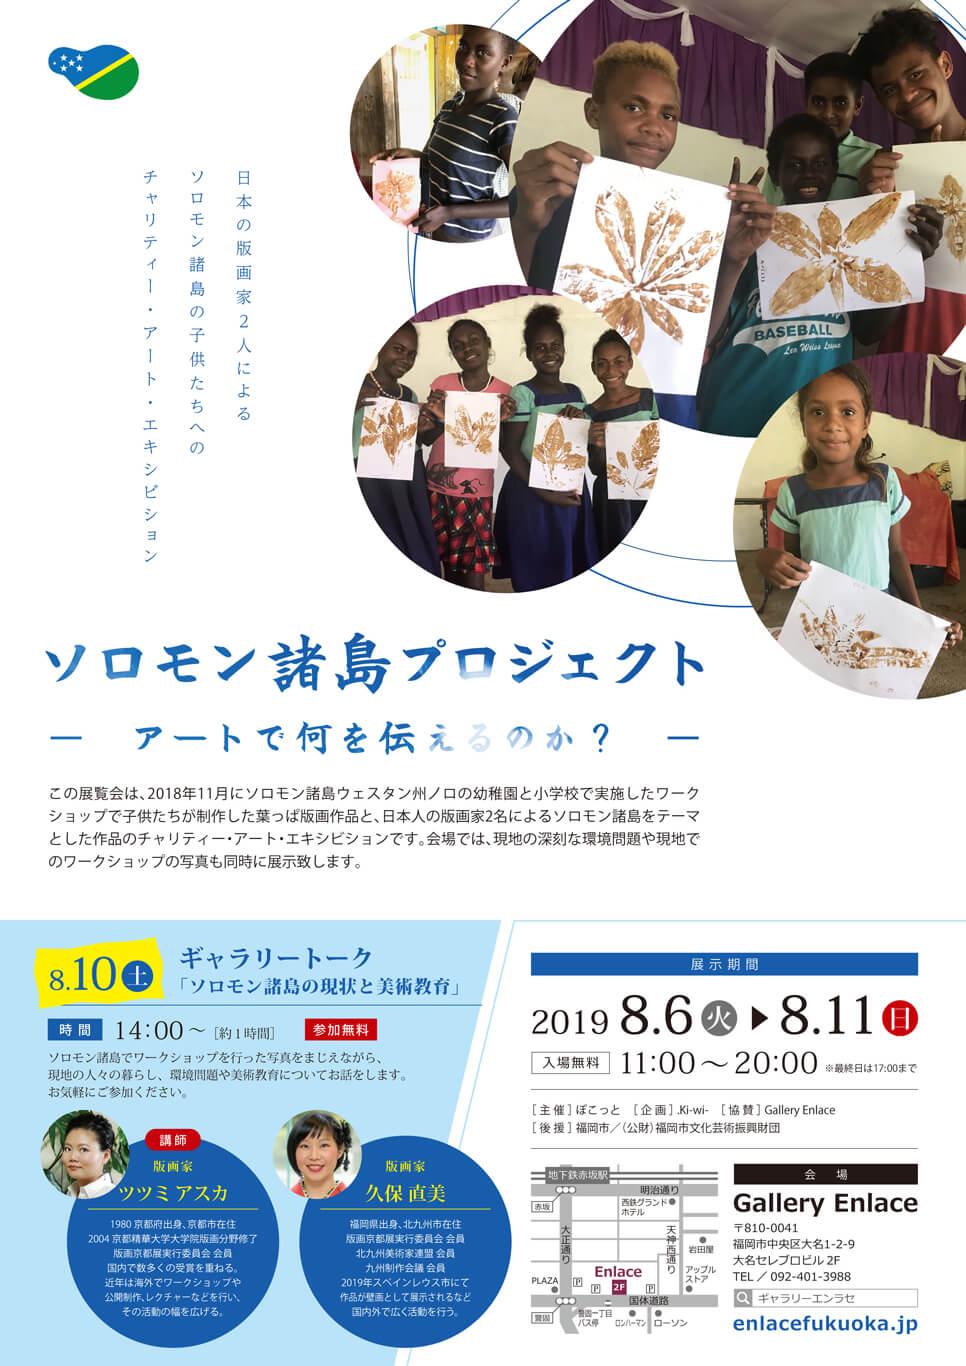 enlc-201908-ツツミ アスカ-久保 直美-展覧会